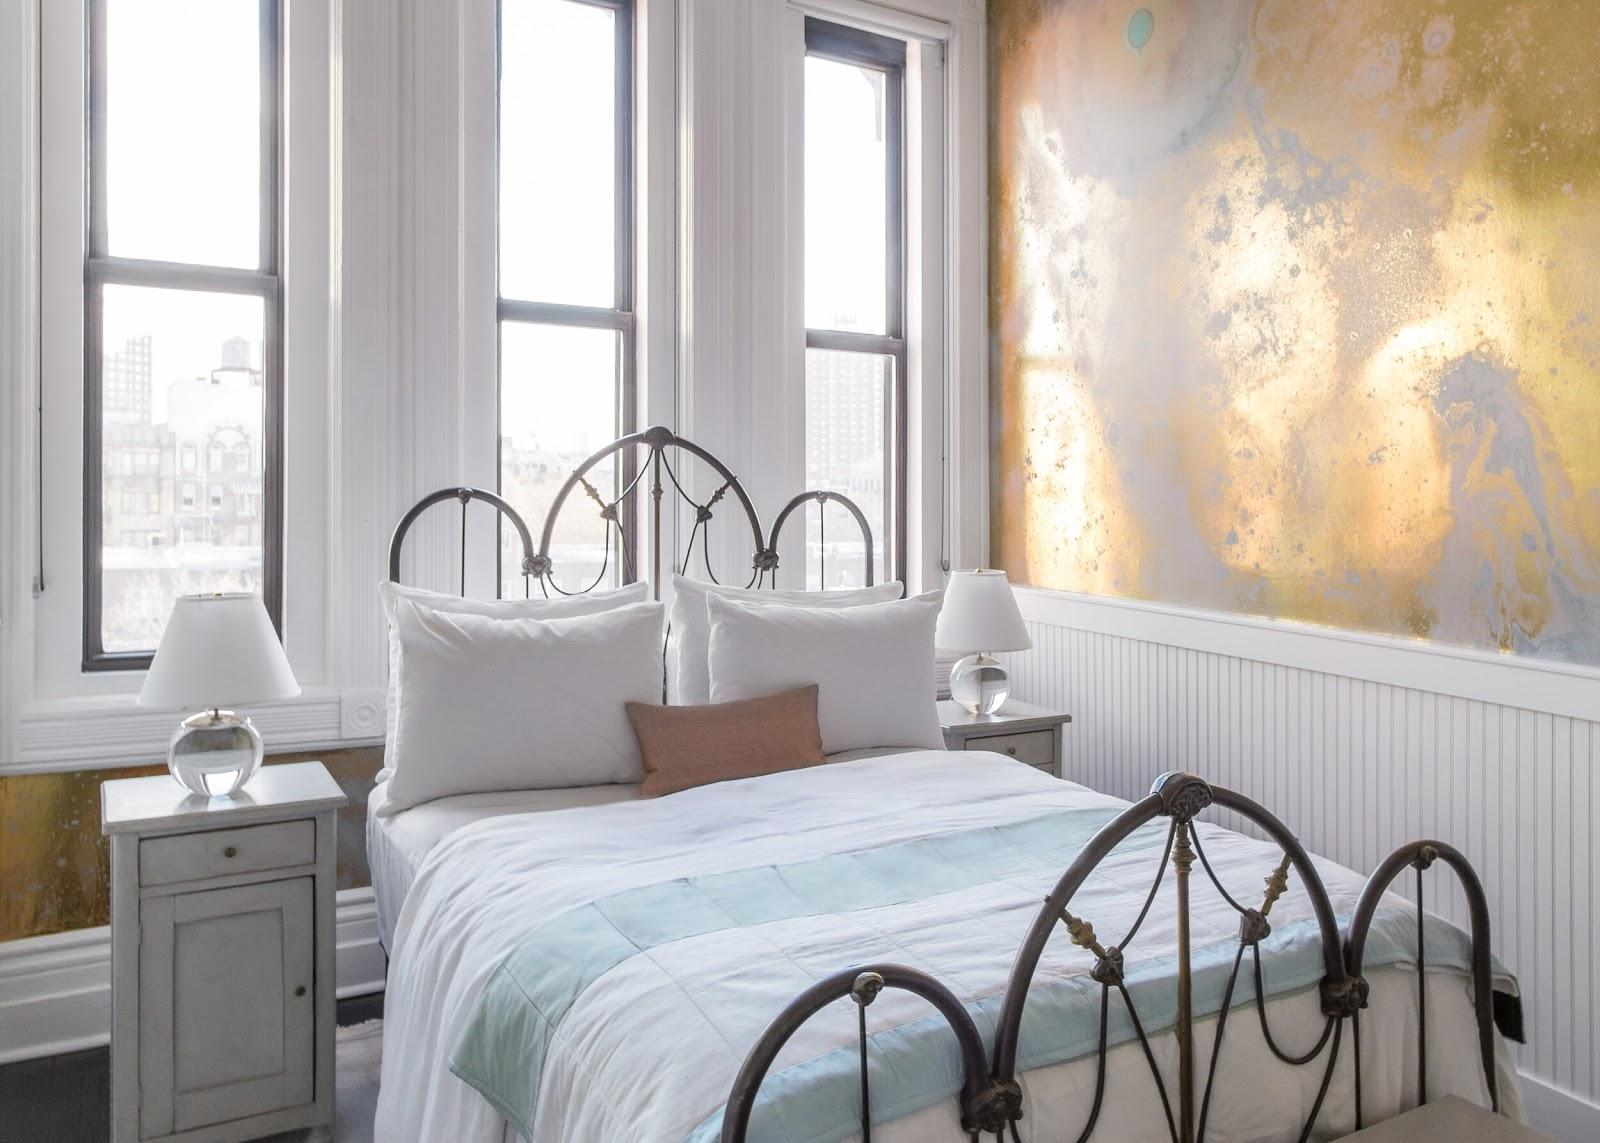 Décor Inspiration: A Williamsburg Schoolhouse, Brooklyn, New York